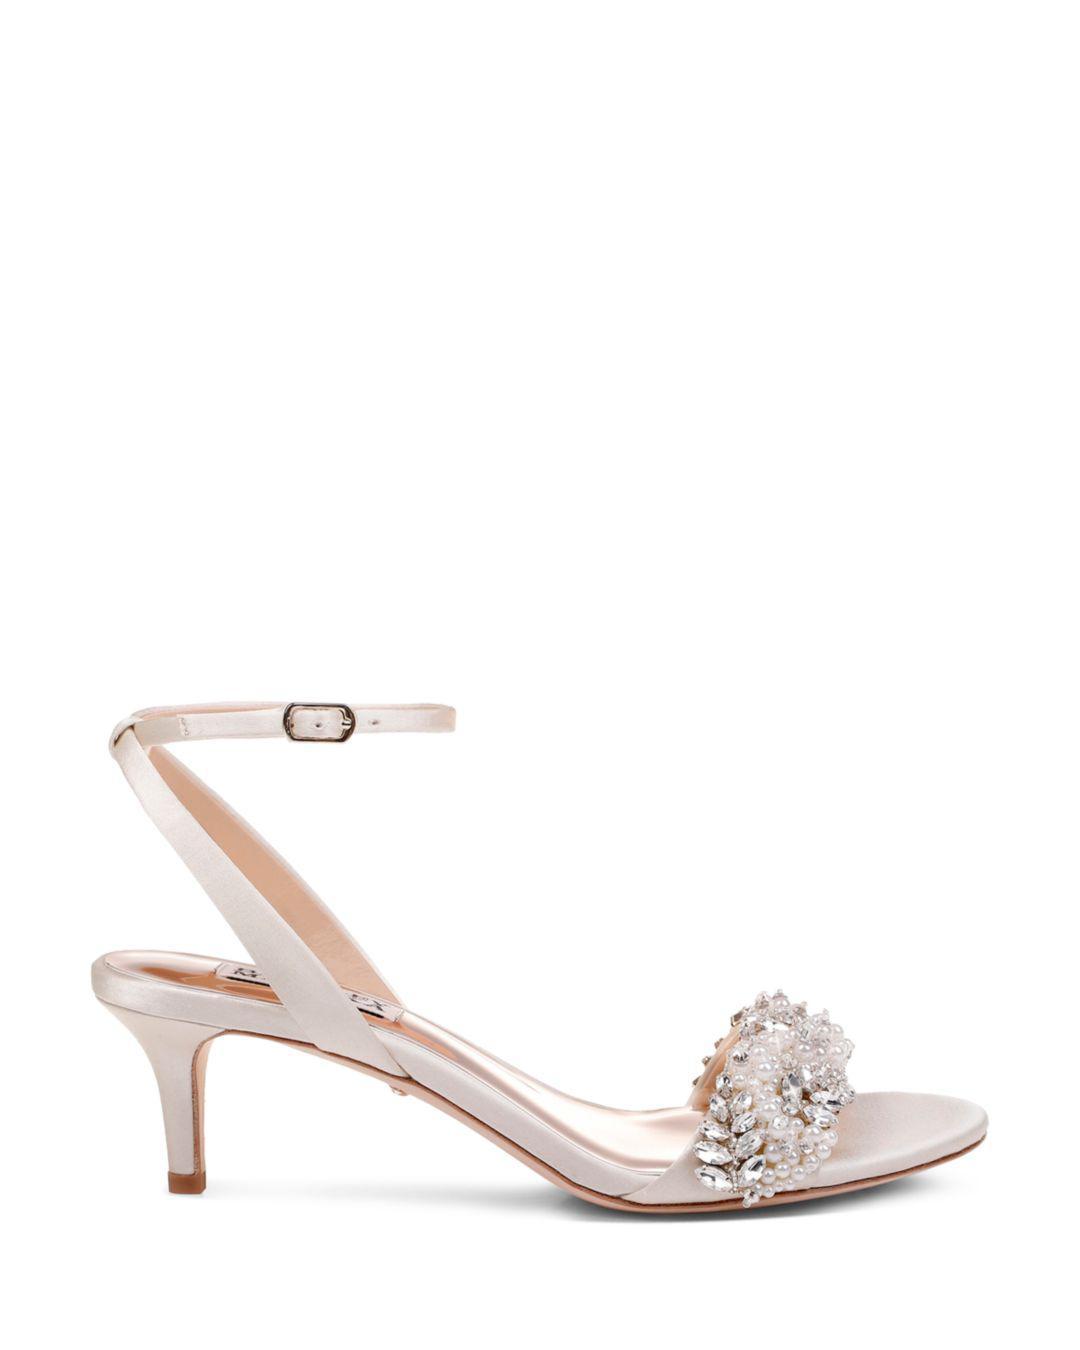 2da5ed52a Lyst - Badgley Mischka Women s Fiona Embellished Kitten Heel Sandals in  White